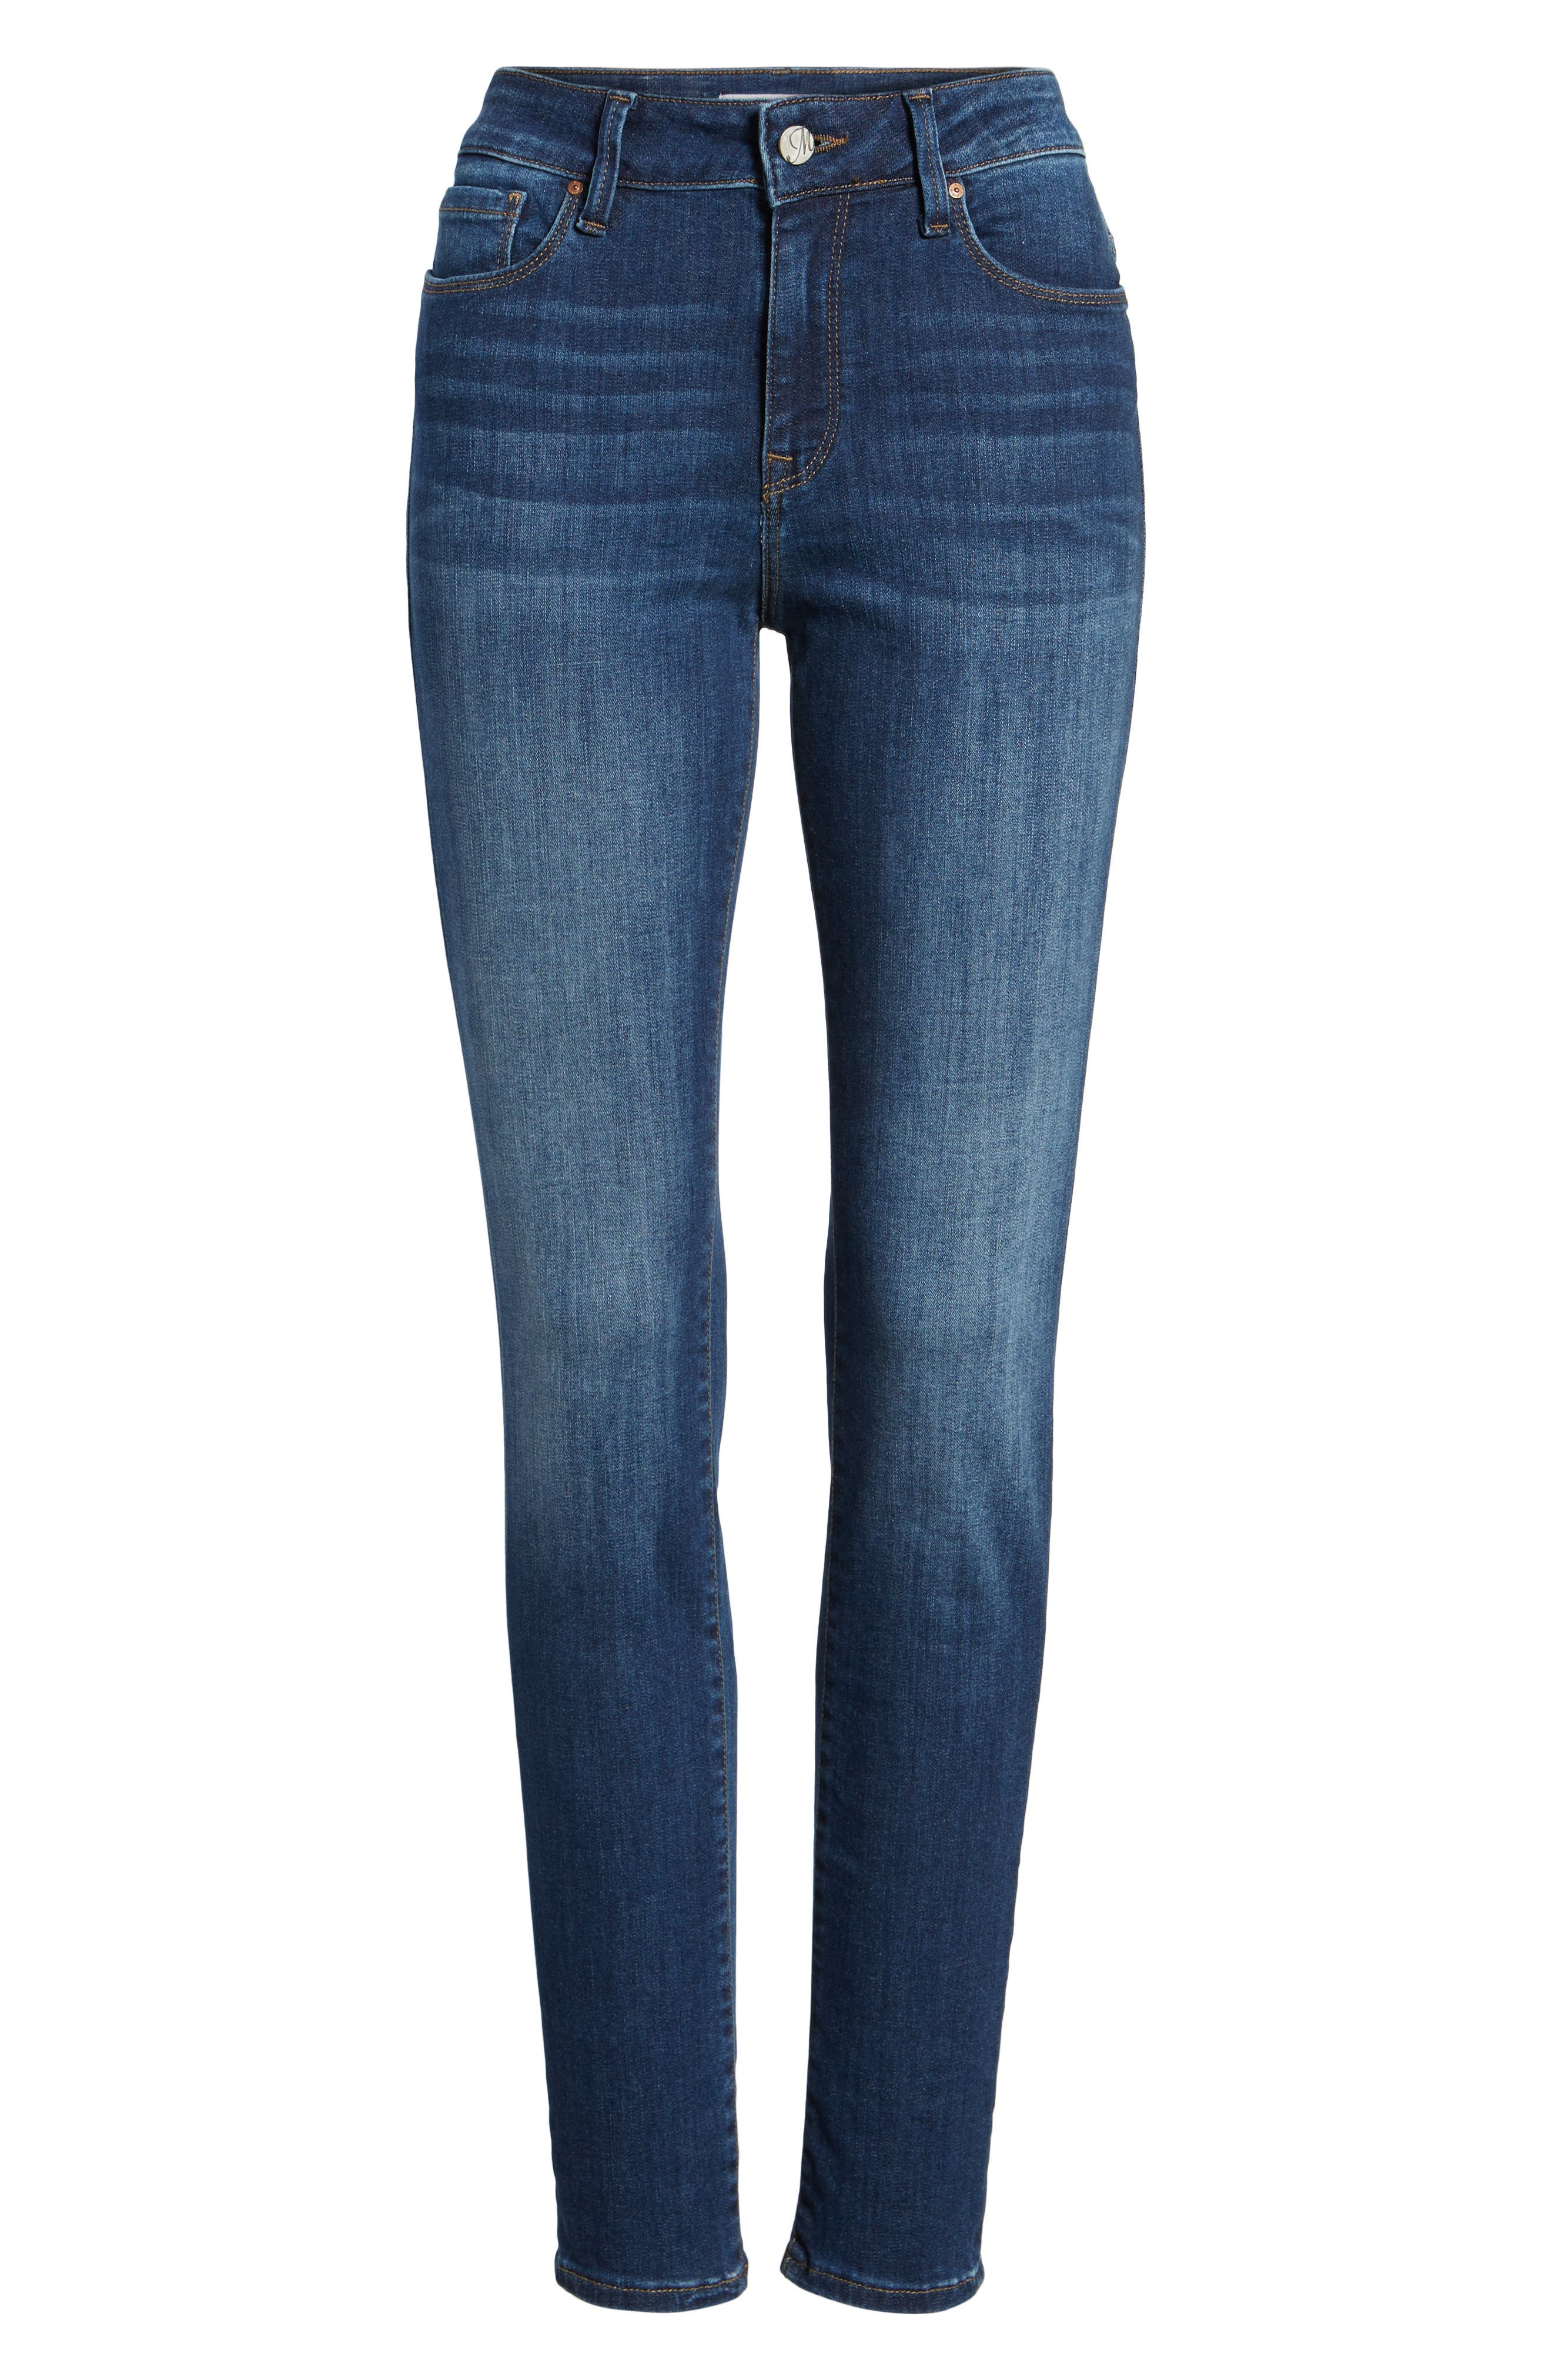 Alissa Super Skinny Jeans,                             Alternate thumbnail 6, color,                             401